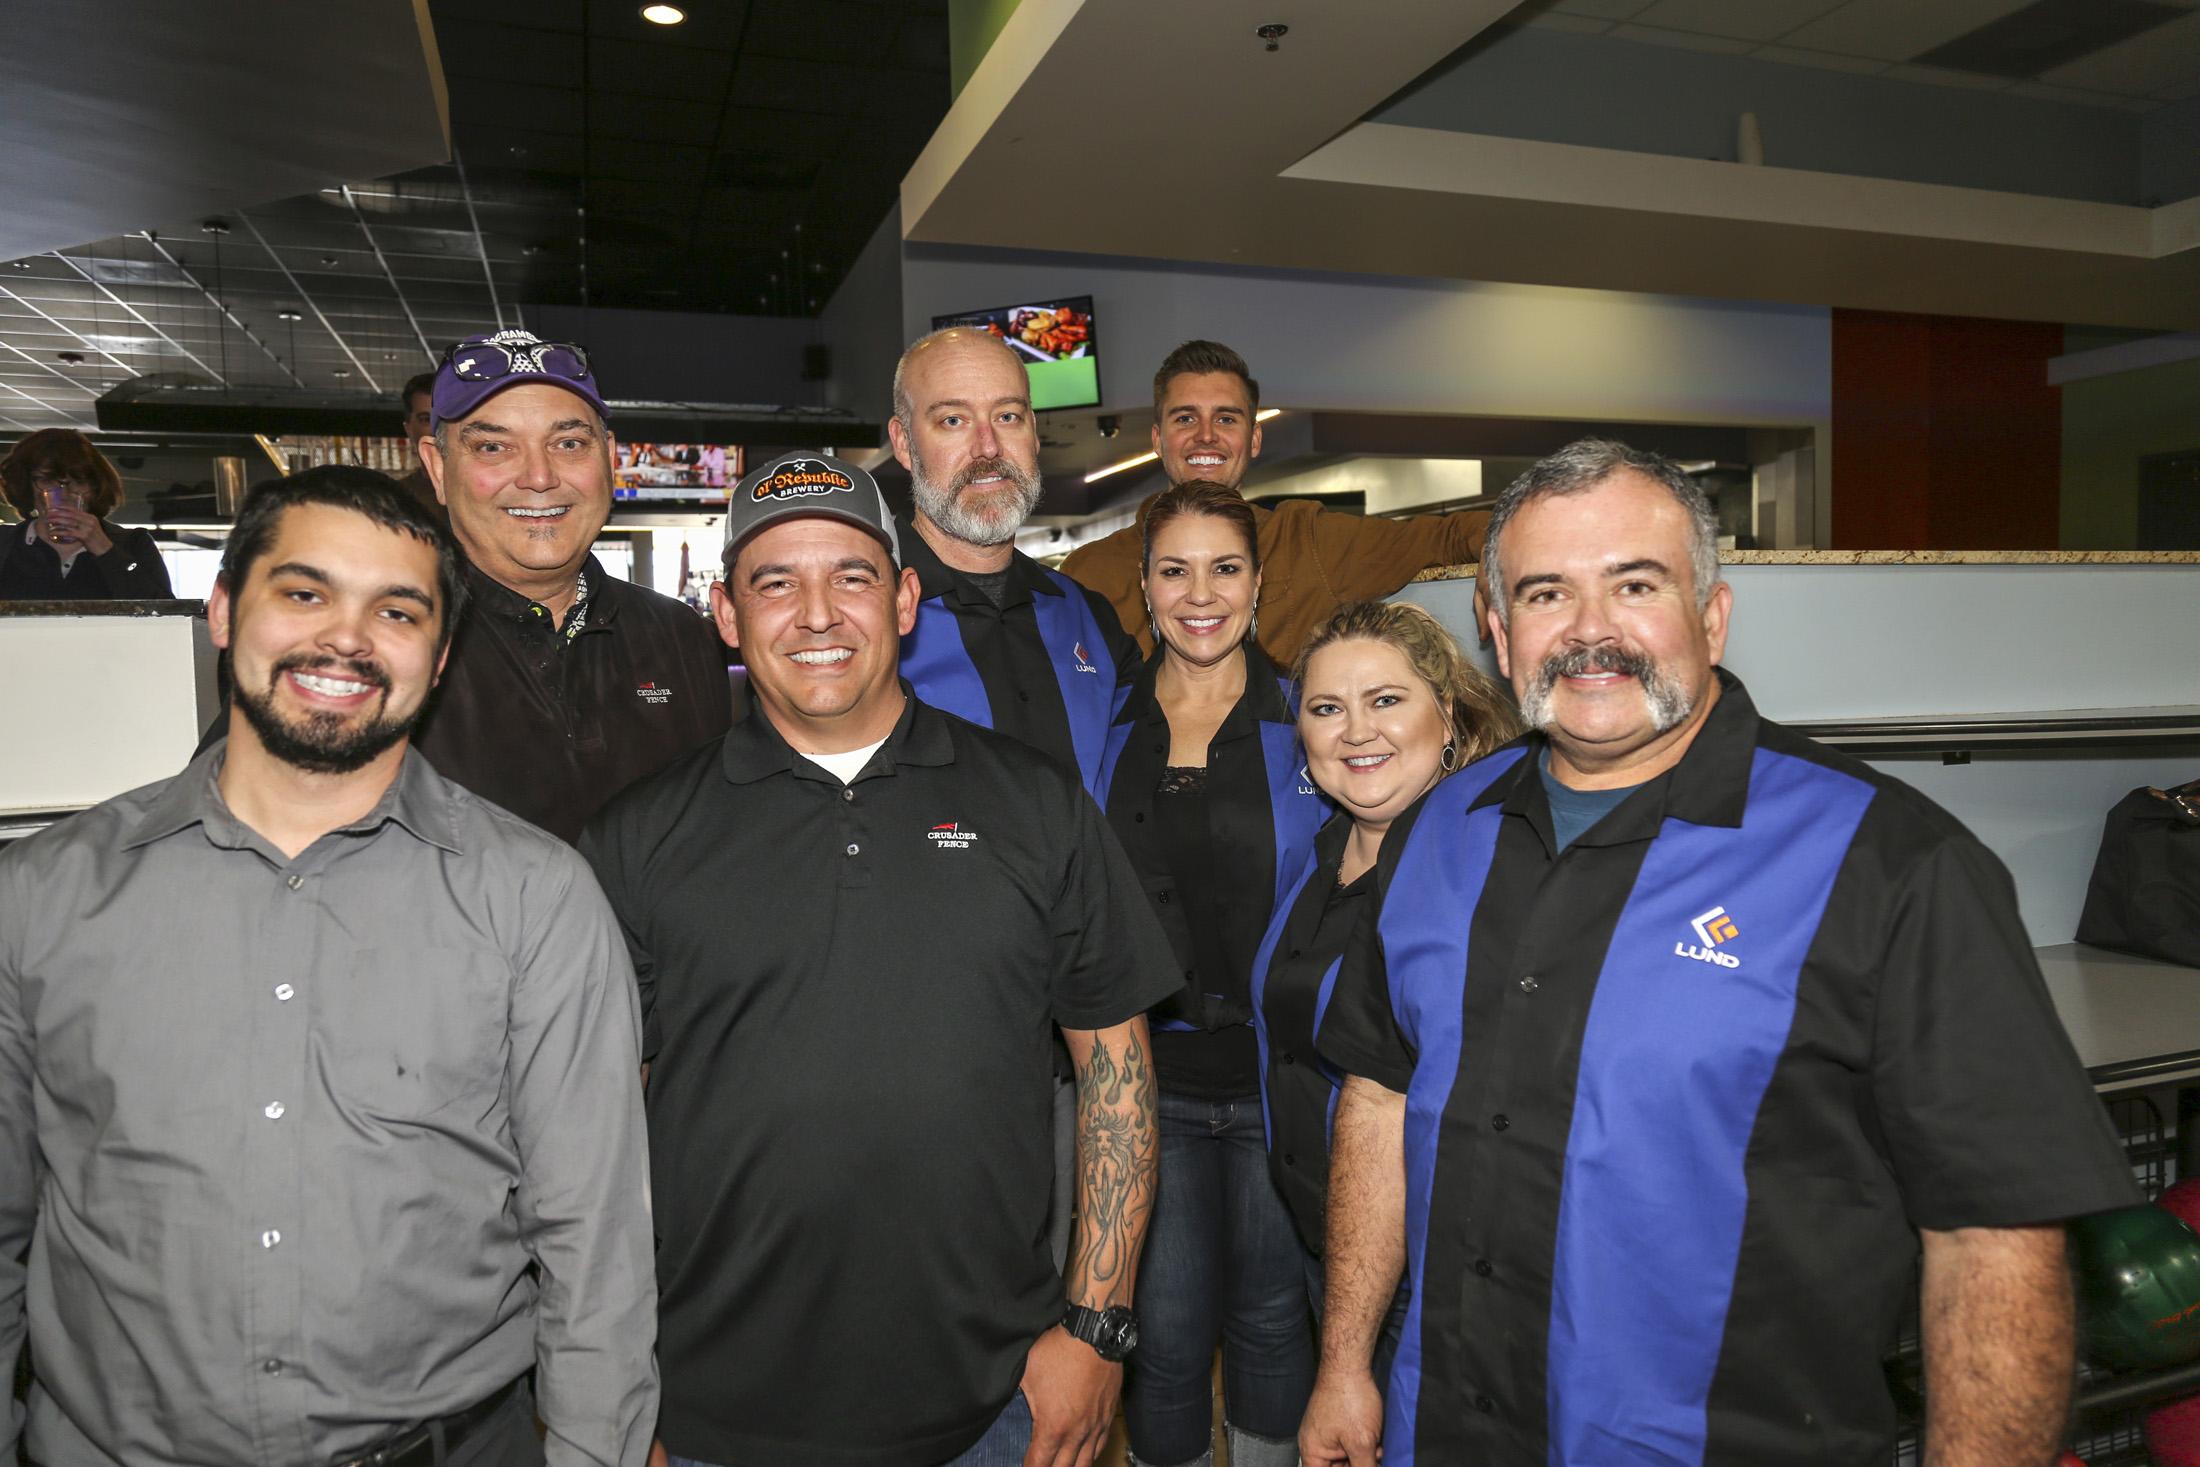 06_ASA Bowling Tourney 2019